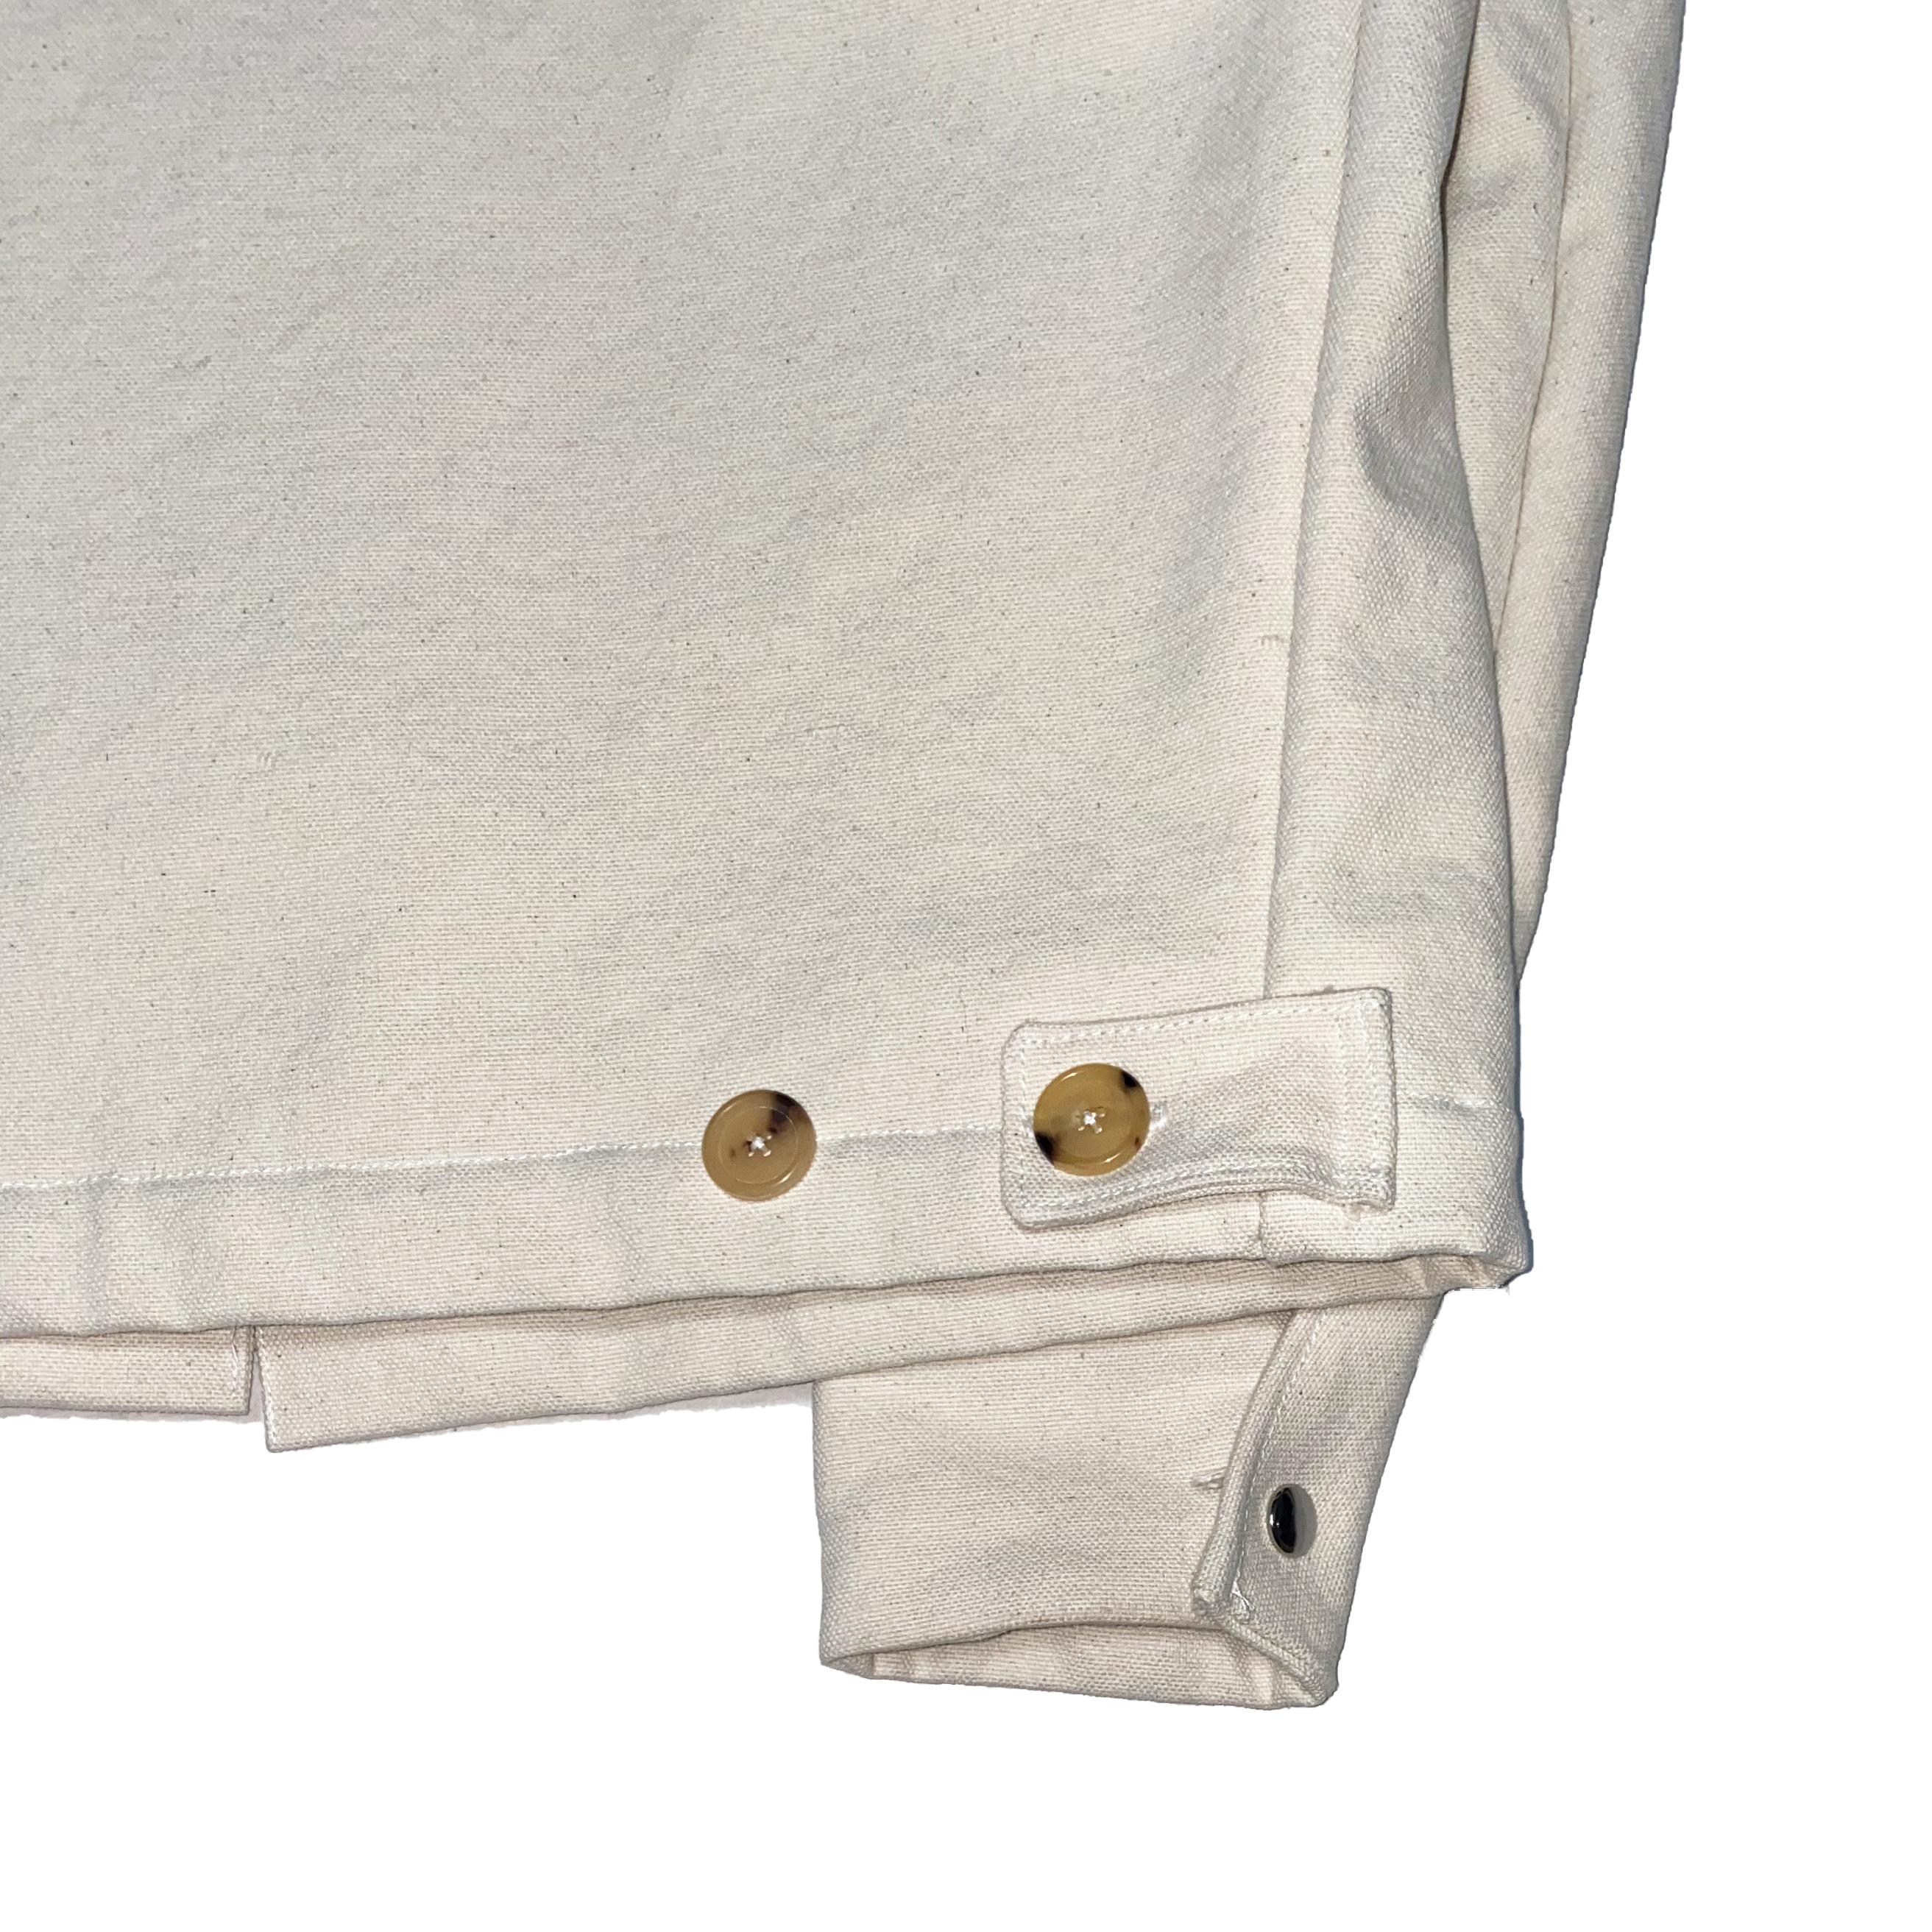 Petroit Work Jacket / White - 画像5